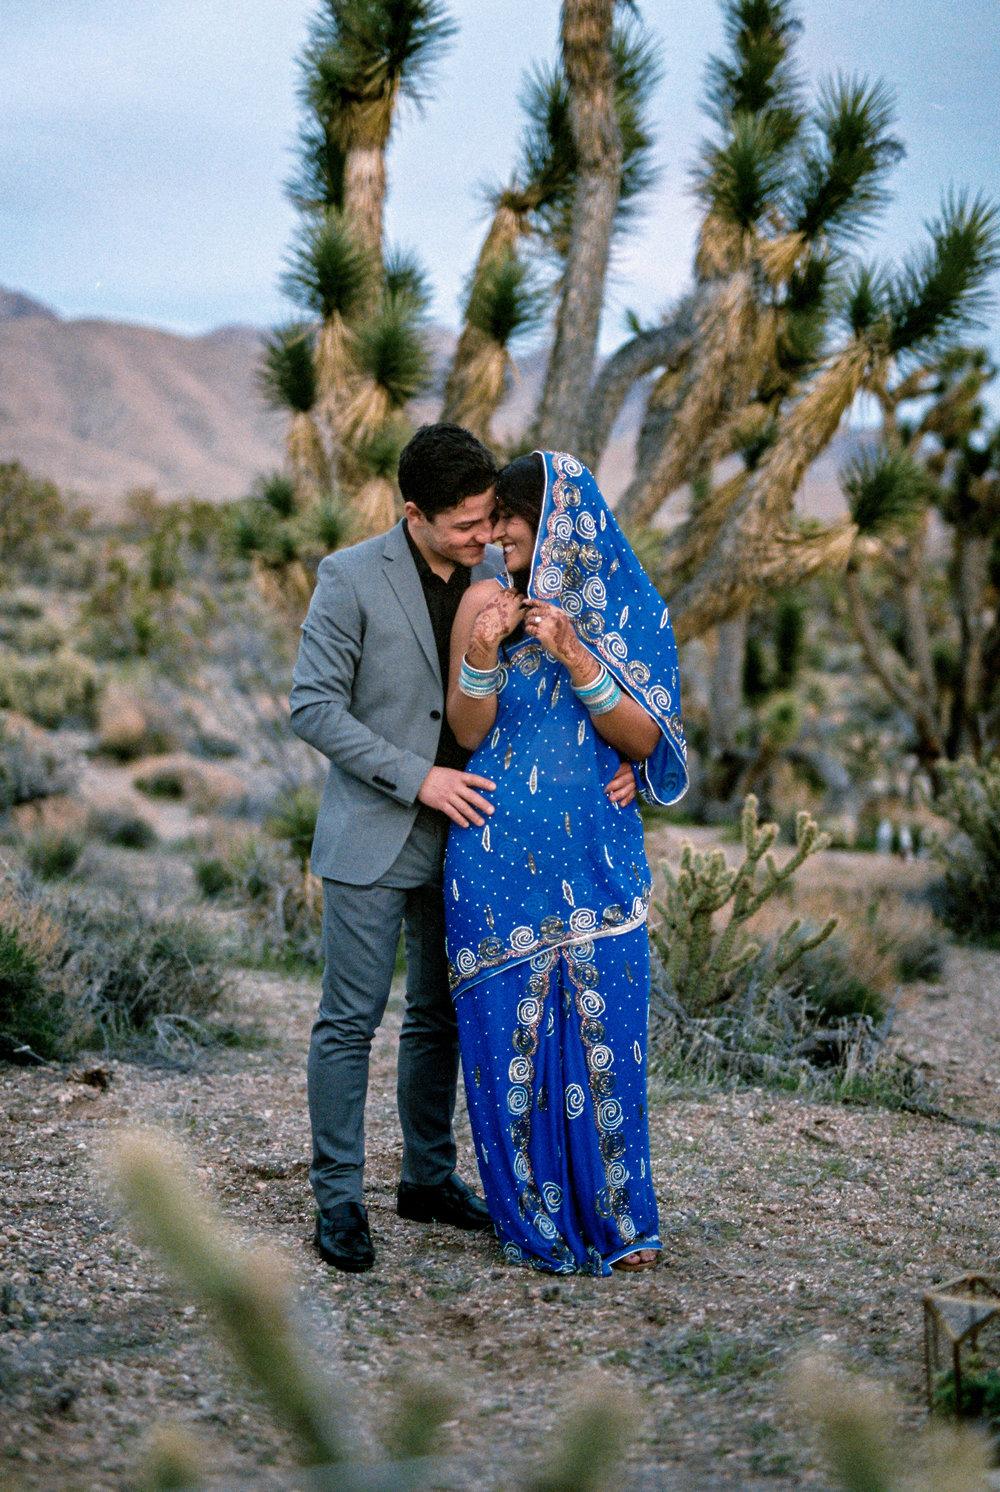 Interracial couple elopes in the Joshua tree desert traveling fine art film photographer Kyle Loves Tori Photography